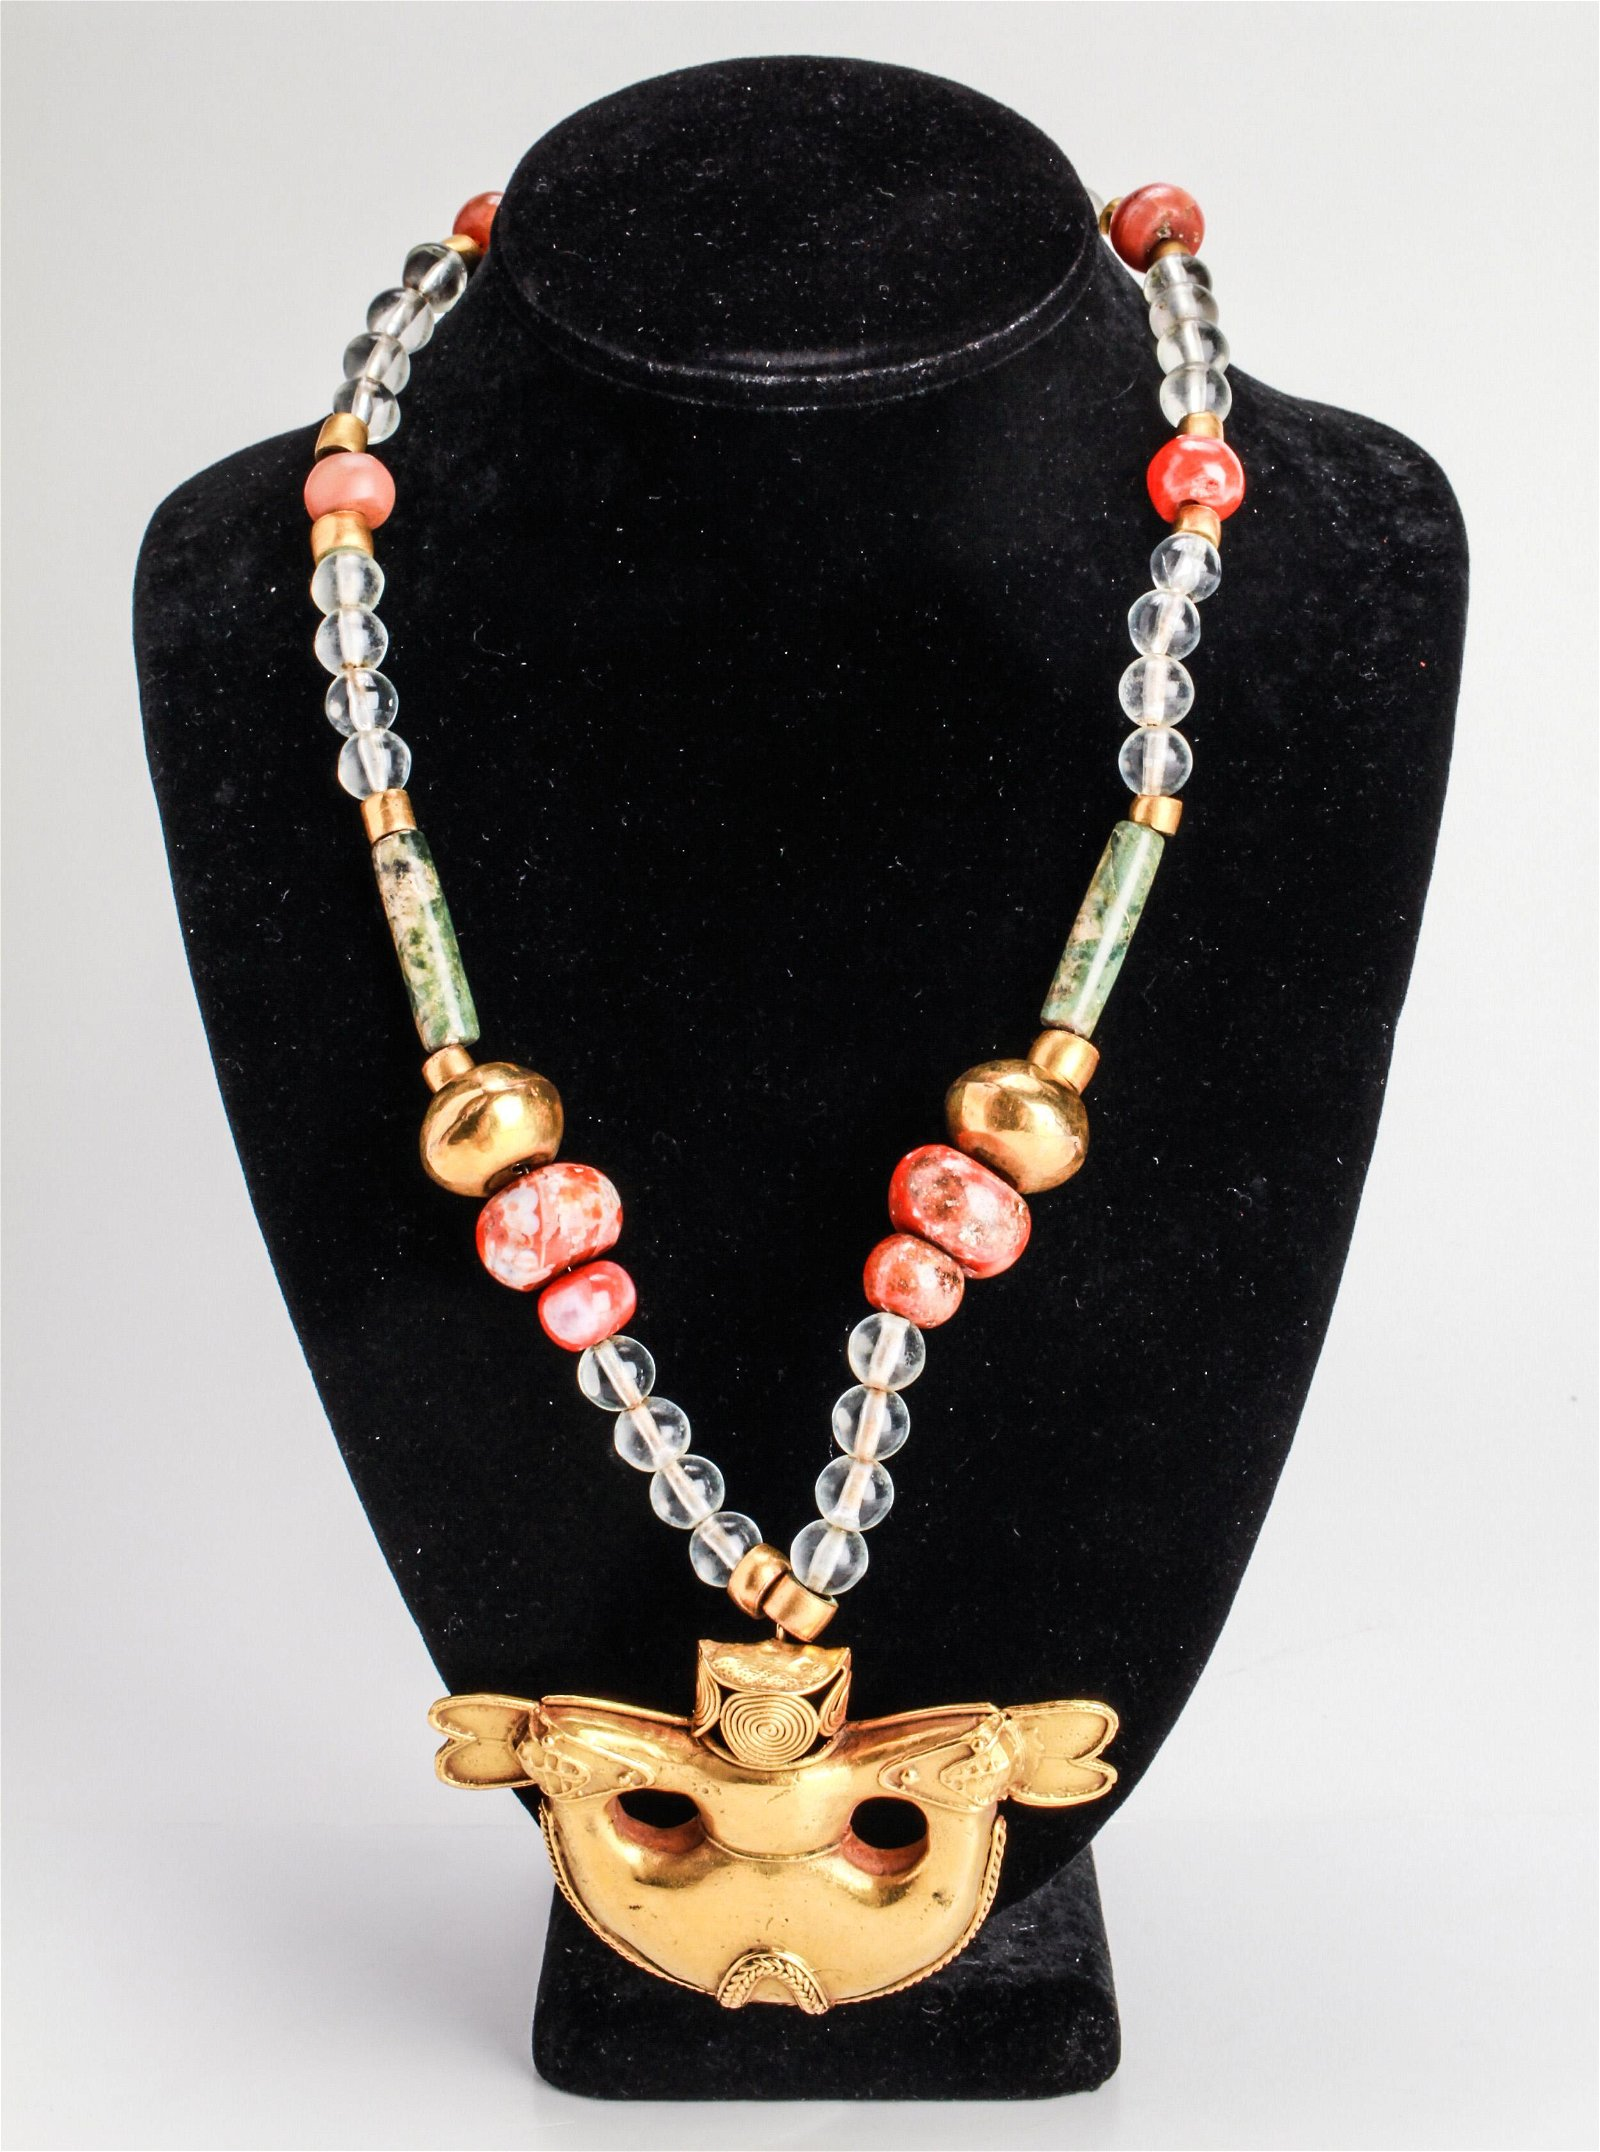 Pre-Columbian Tumbaga Gold Pendant Beads Necklace